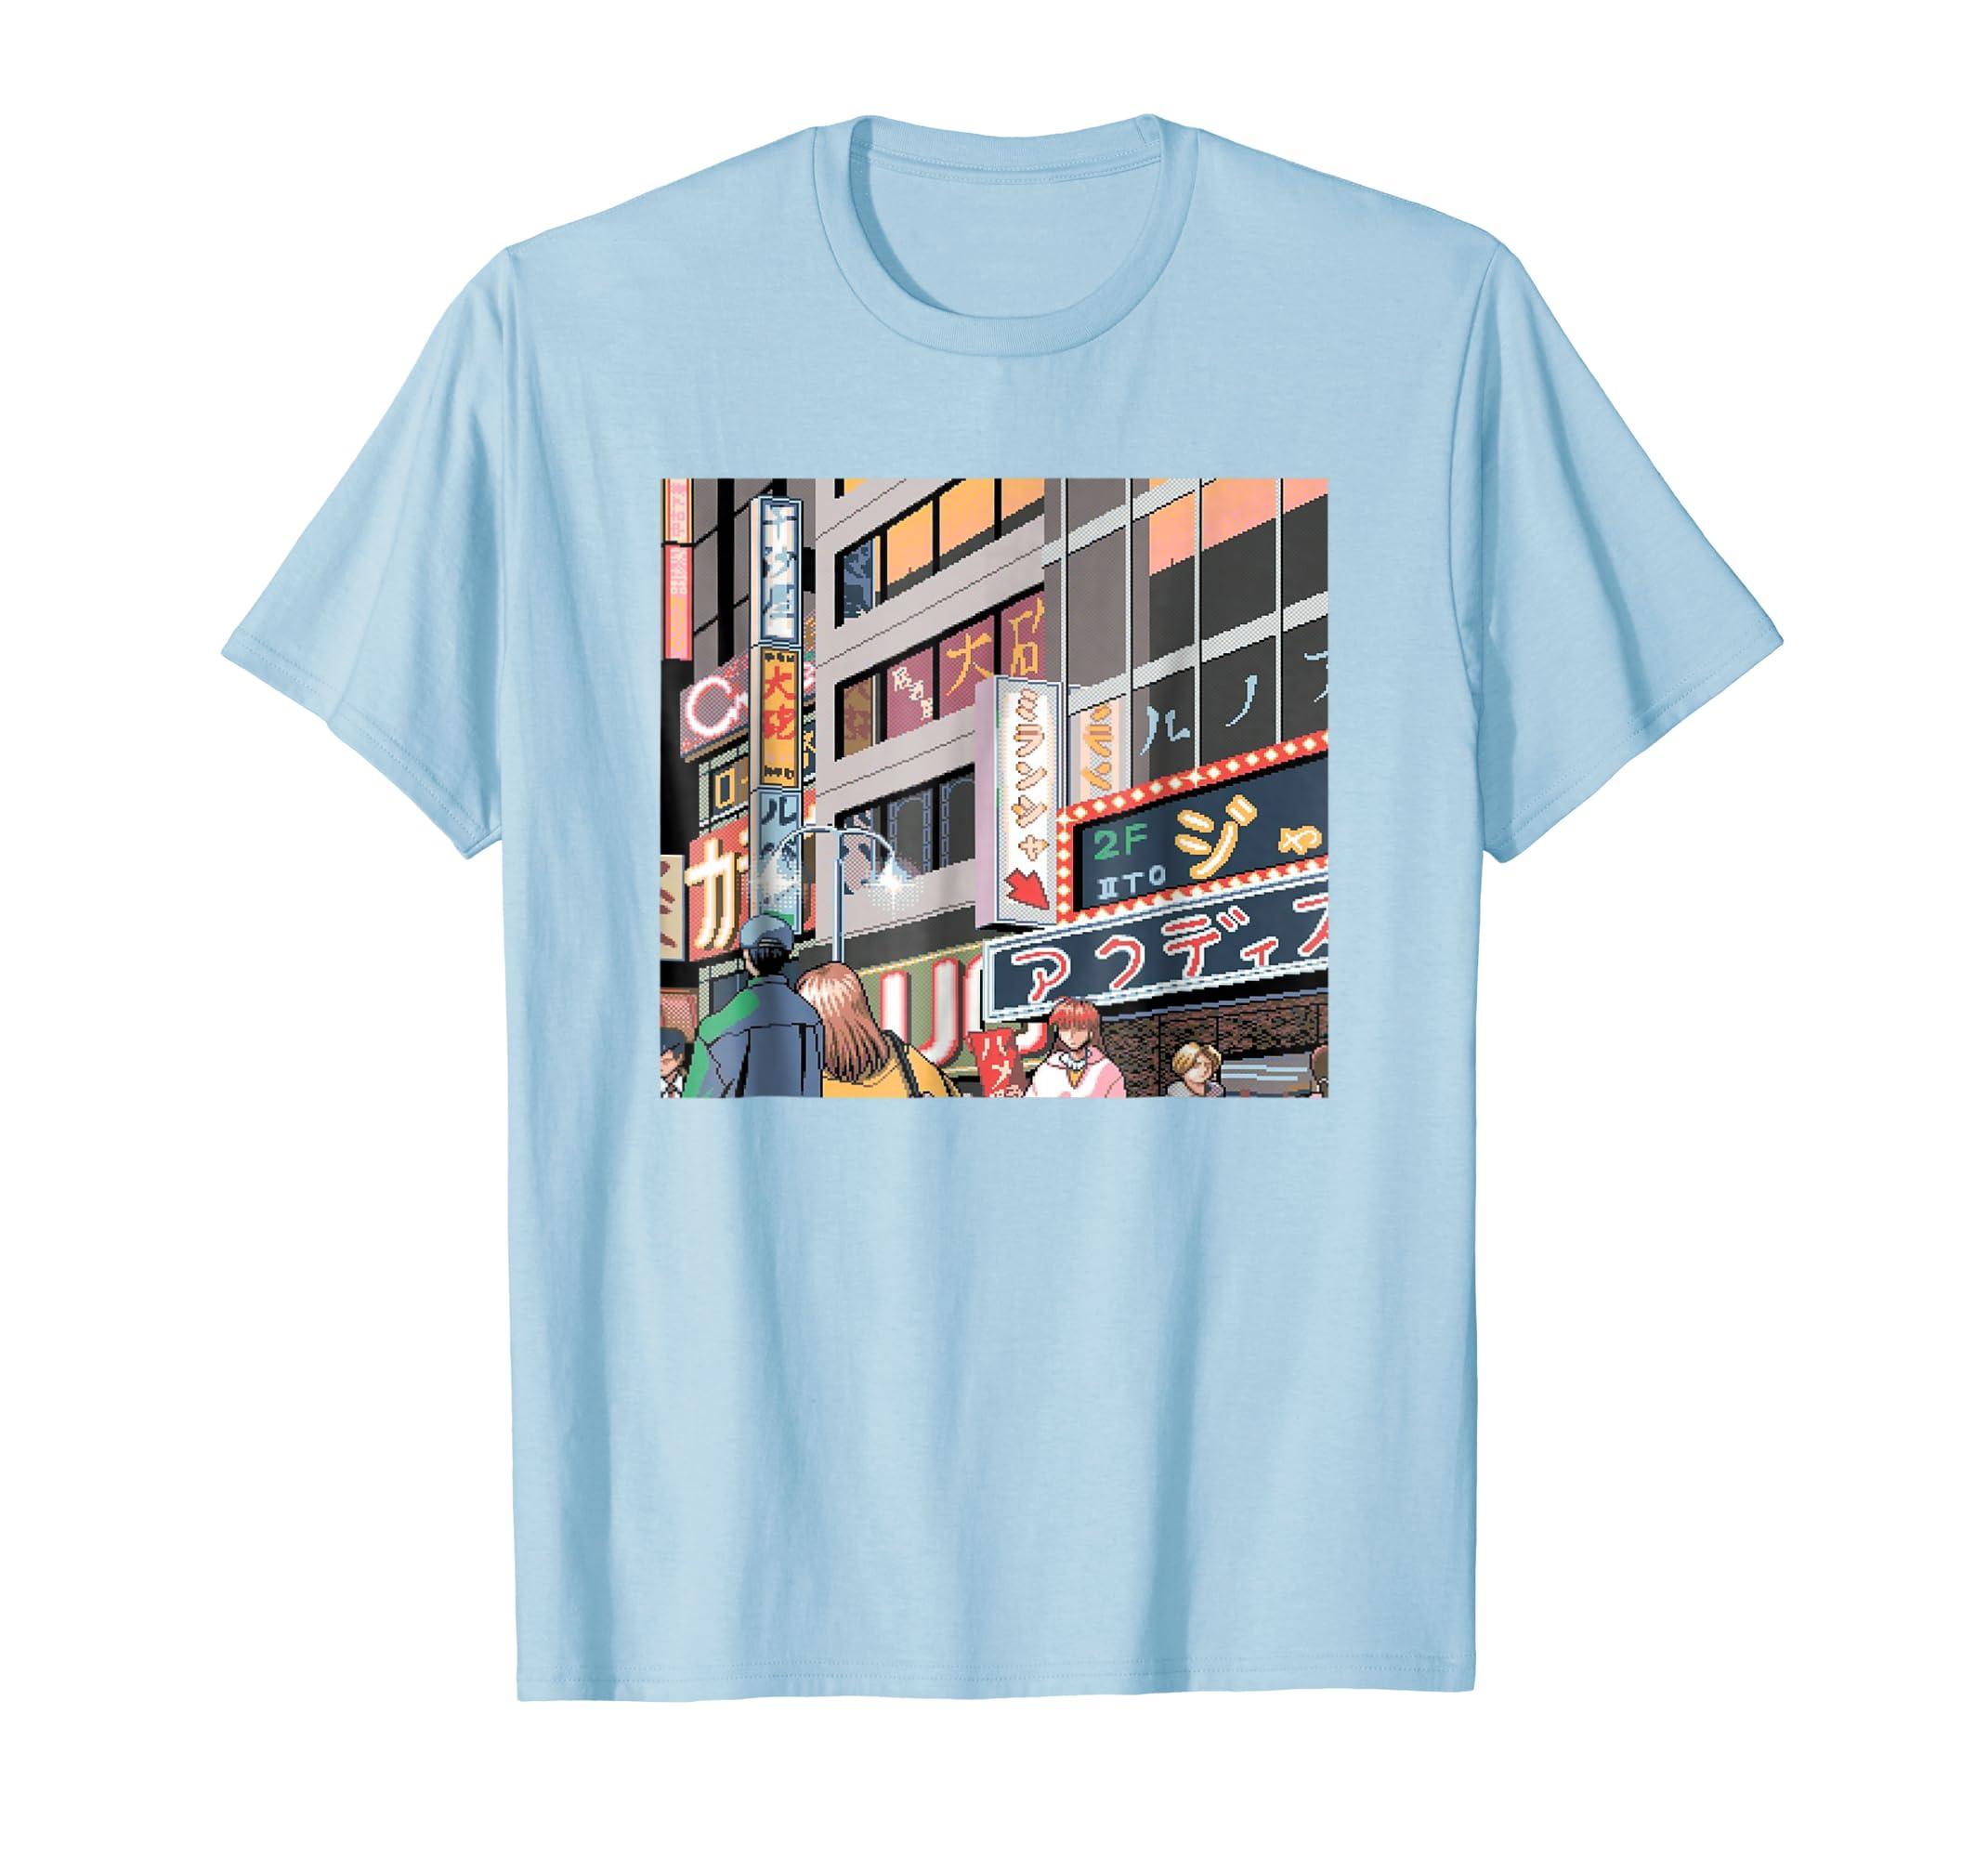 Neon Night Tokyo Japan Neon Signs Anime 8 Bit City T Shirt-Colonhue